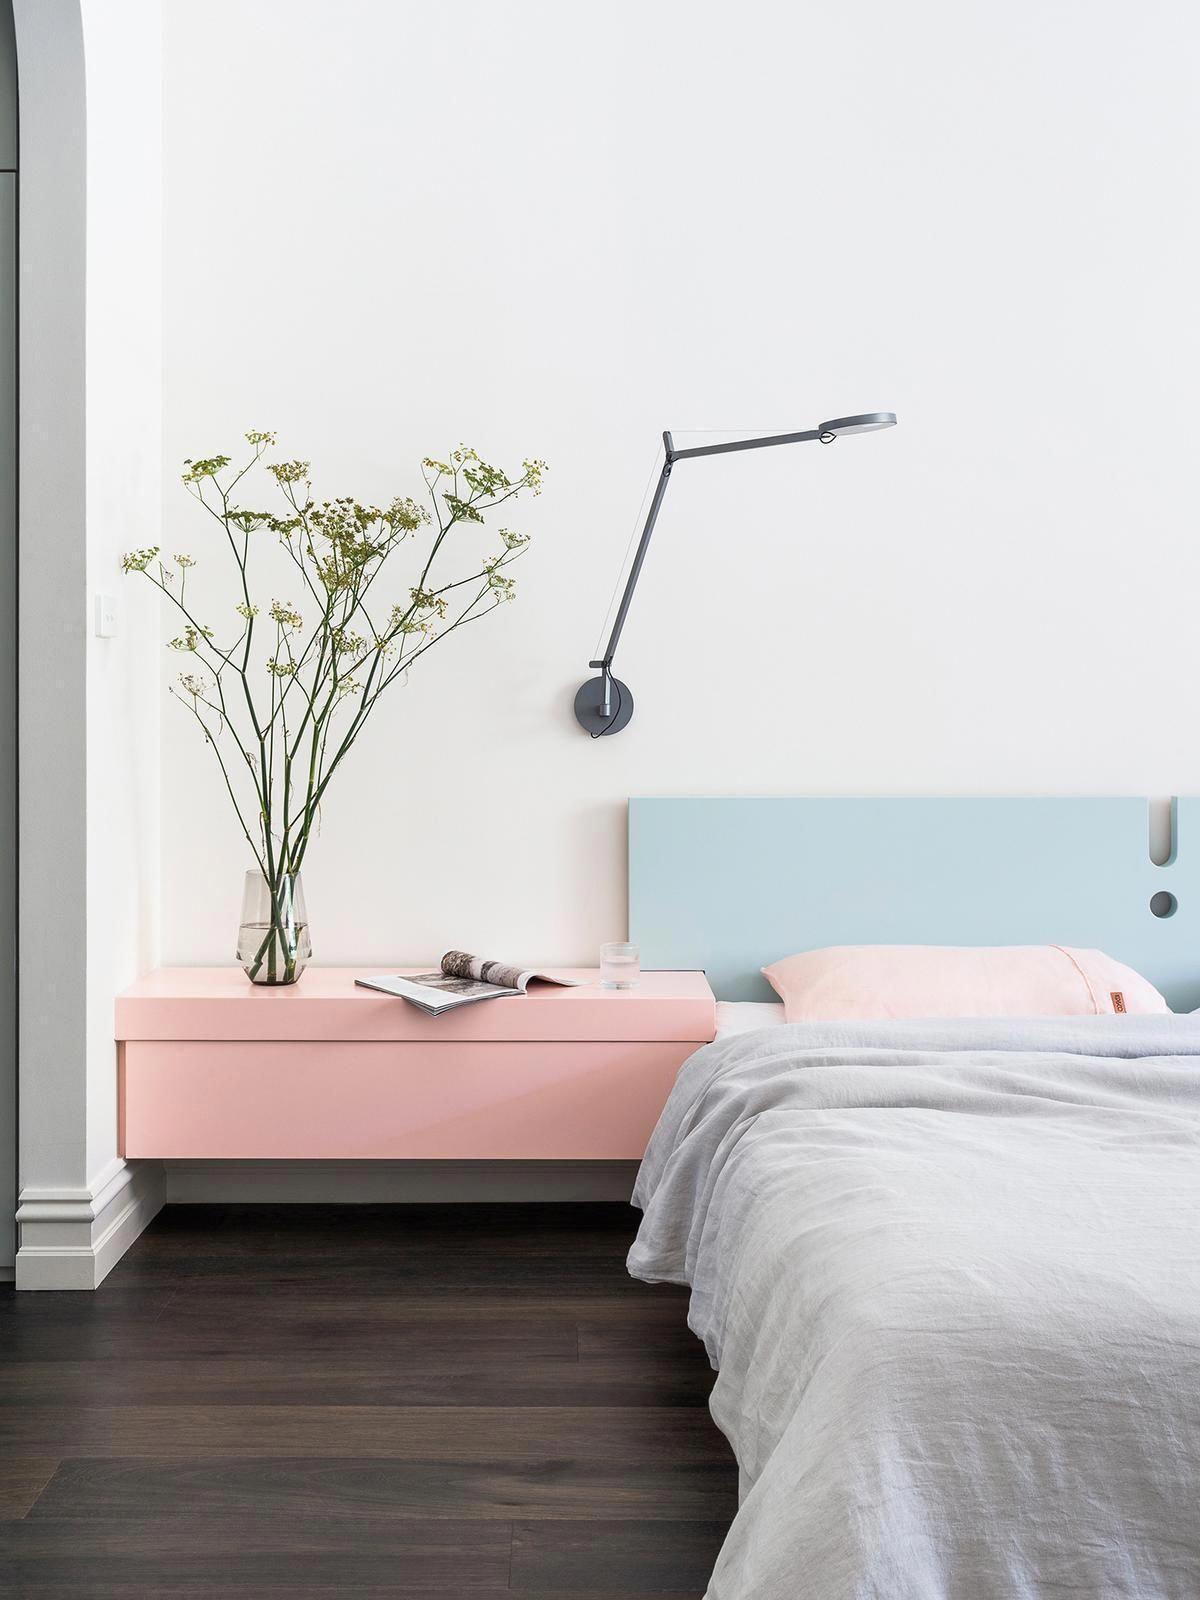 Pink And Blue Minimalist Bedroom Inspiration Pink Blue Bedroomideas Homedecorbedroomideas Home Decor Bedroom Minimalist Bedroom Home Decor Pink minimalist room decoration